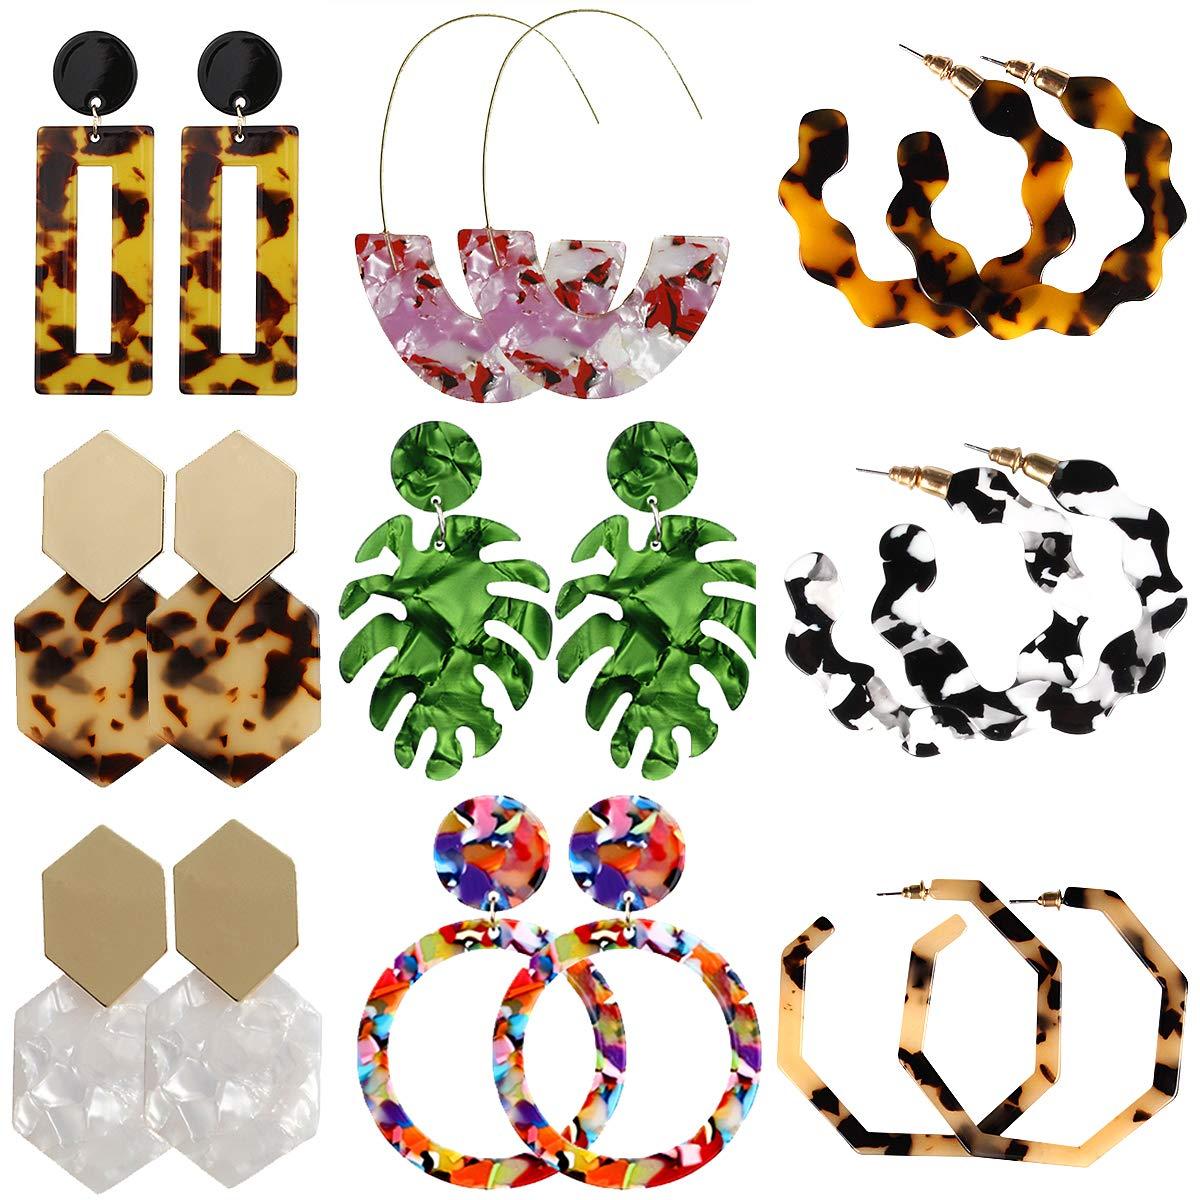 2 Pairs Acrylic Resin Hoop Dangle Earrings for Women Girls Bohemian Statement Resin Earring Jewelry